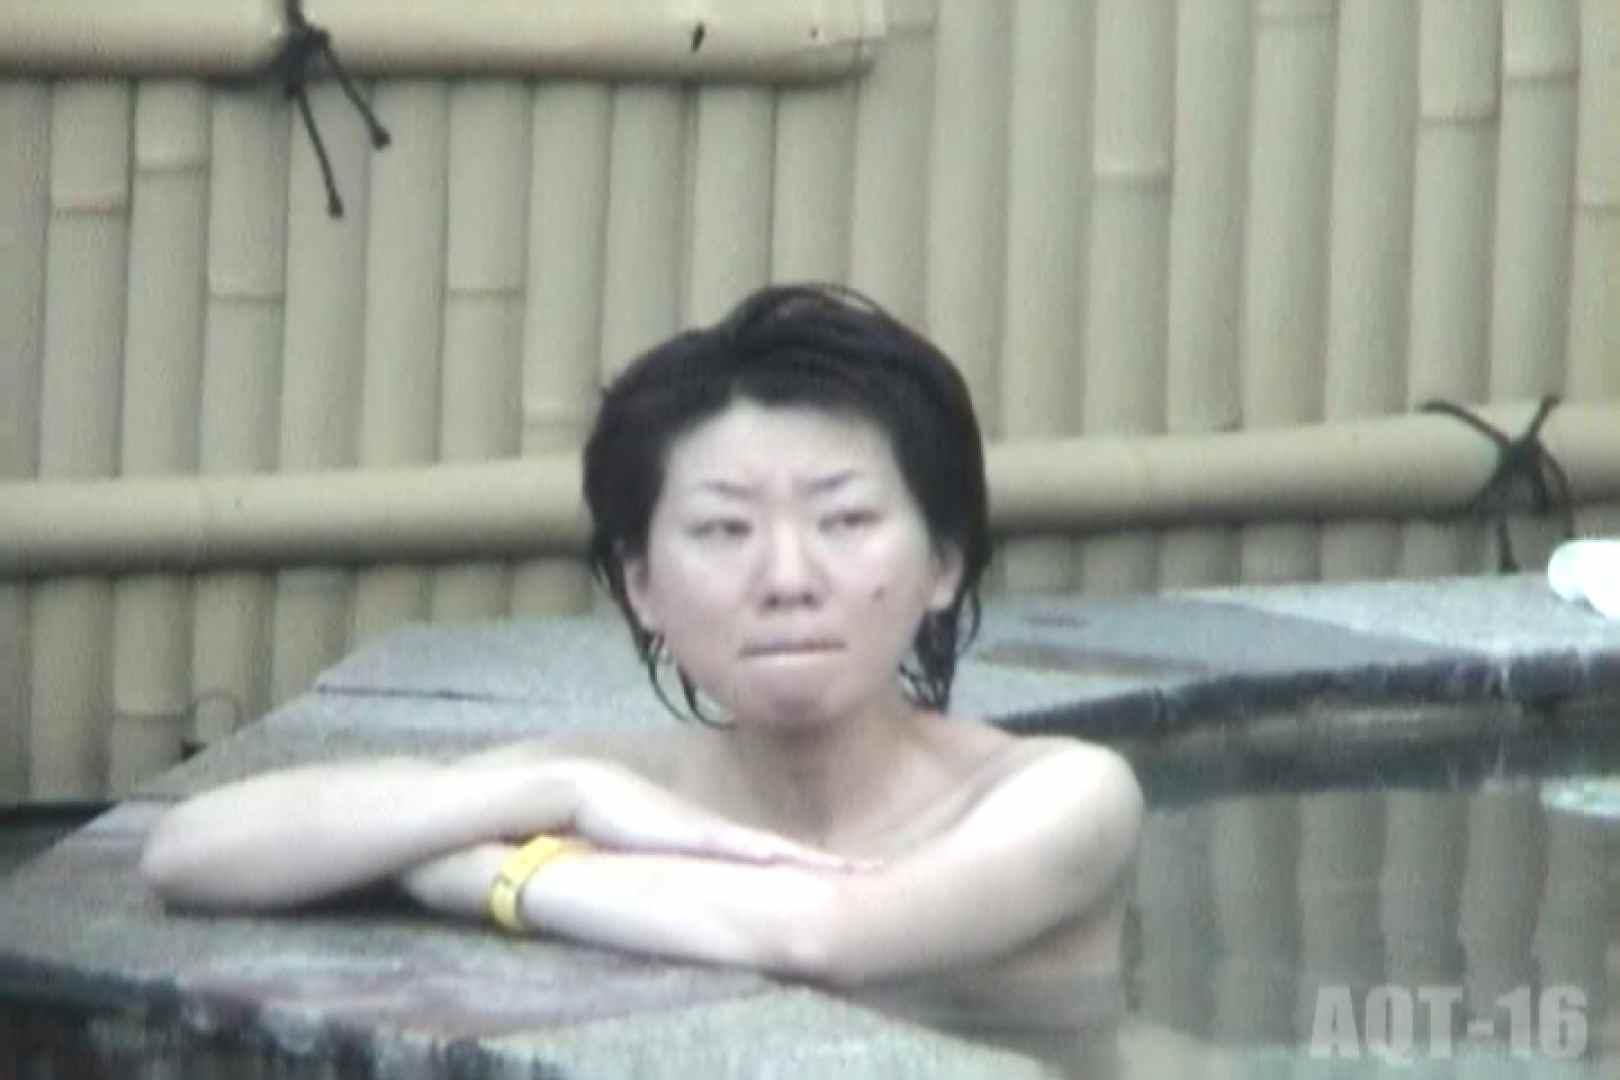 Aquaな露天風呂Vol.842 盗撮師作品  96pic 18